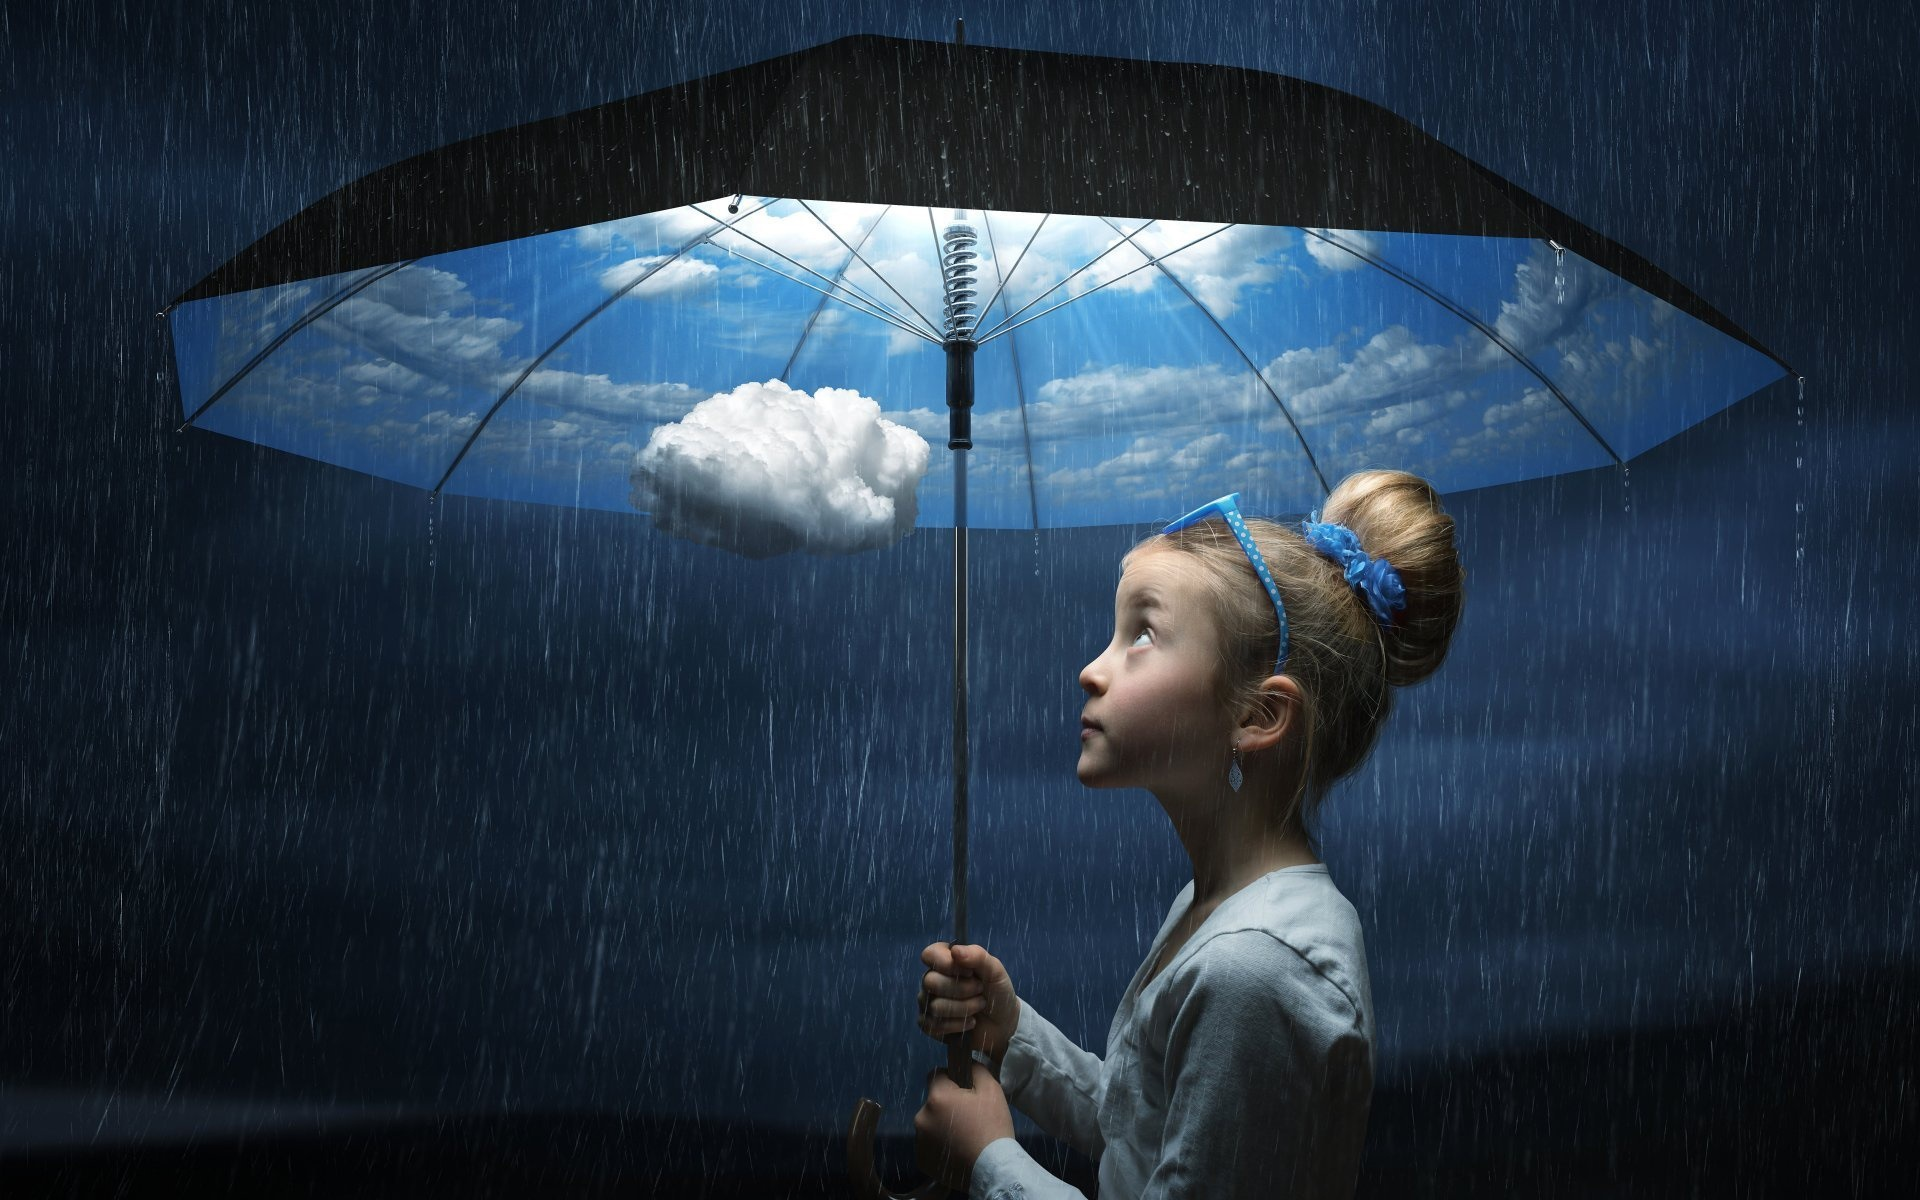 Umbrella-child-girl-rainy-sky-clouds-creative-picture_1920x1200.jpg